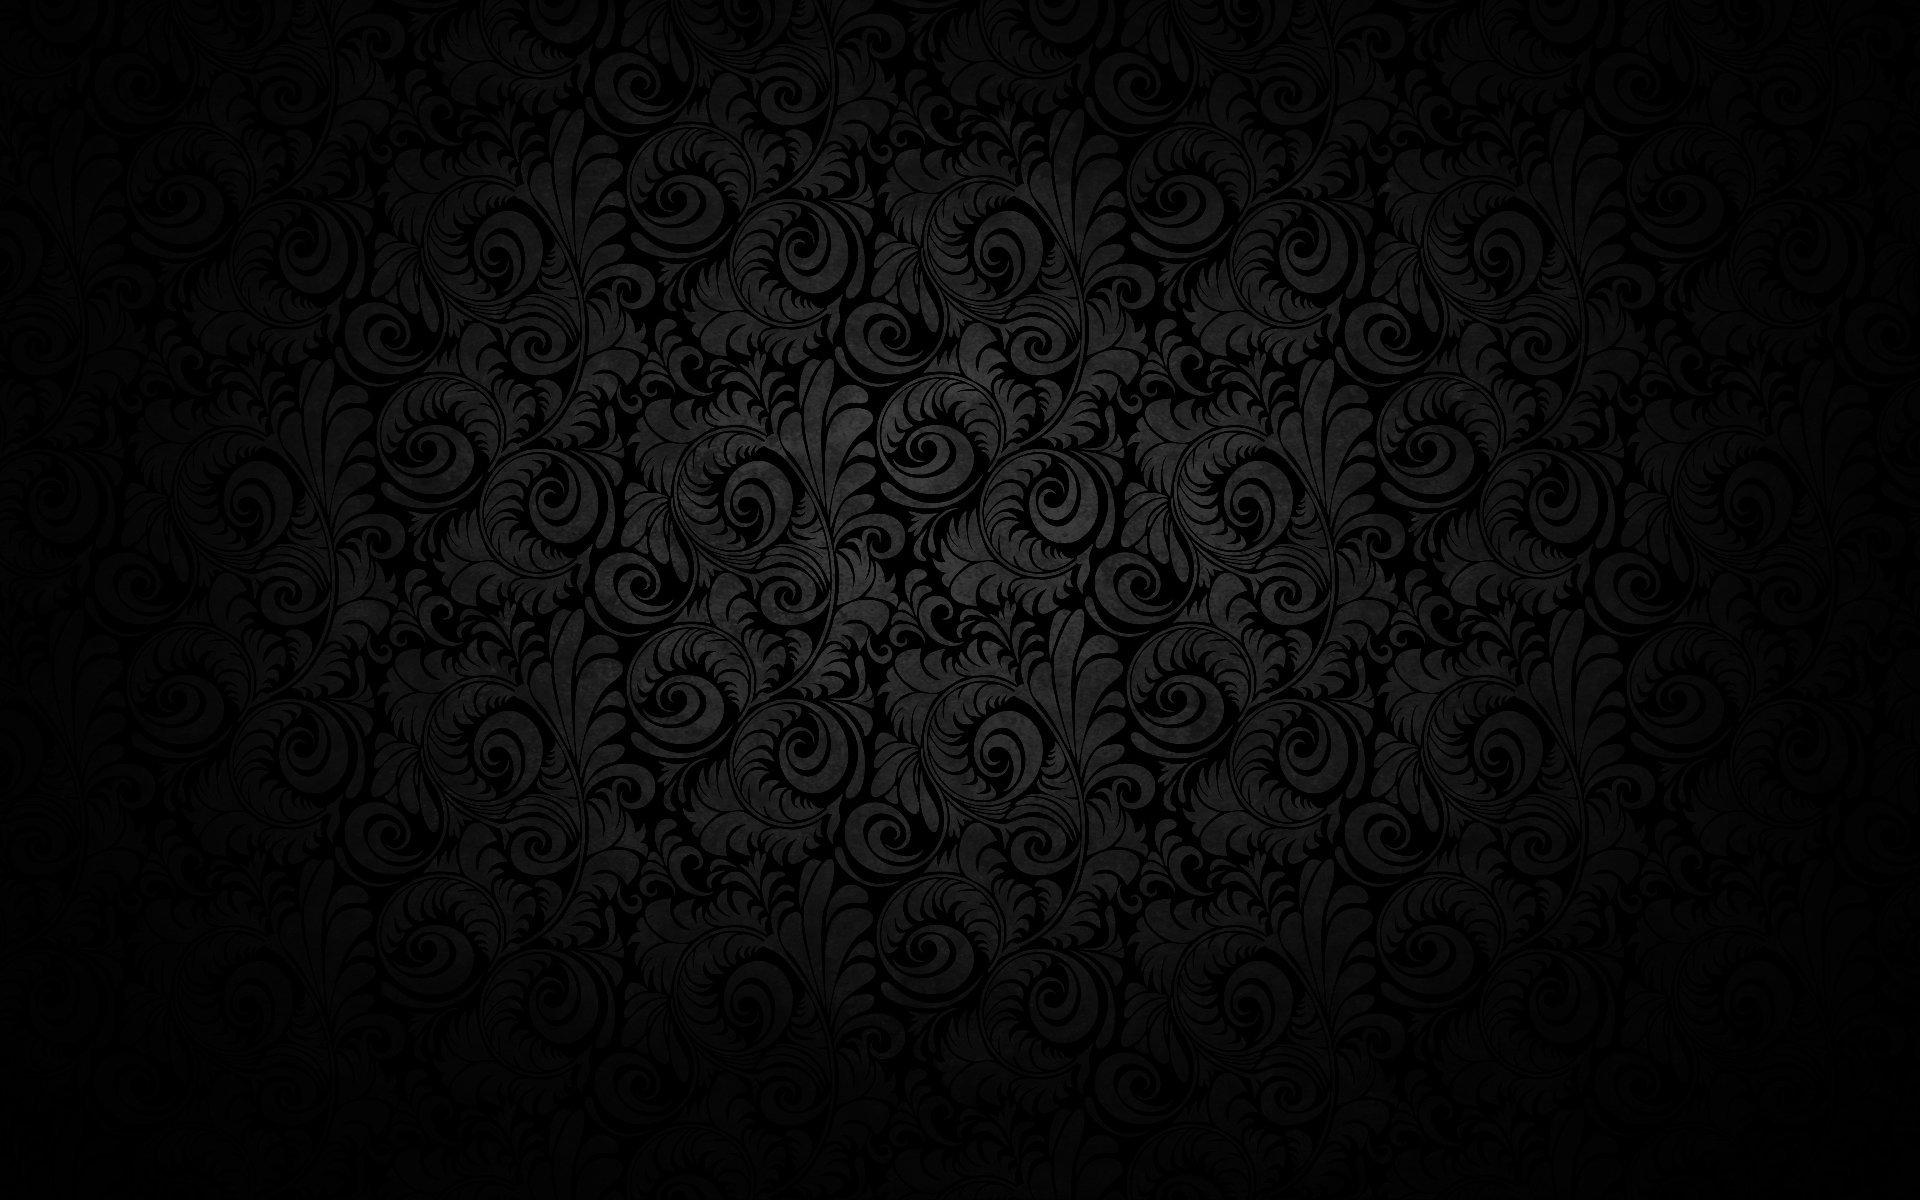 Black Background wallpaper   742082 1920x1200